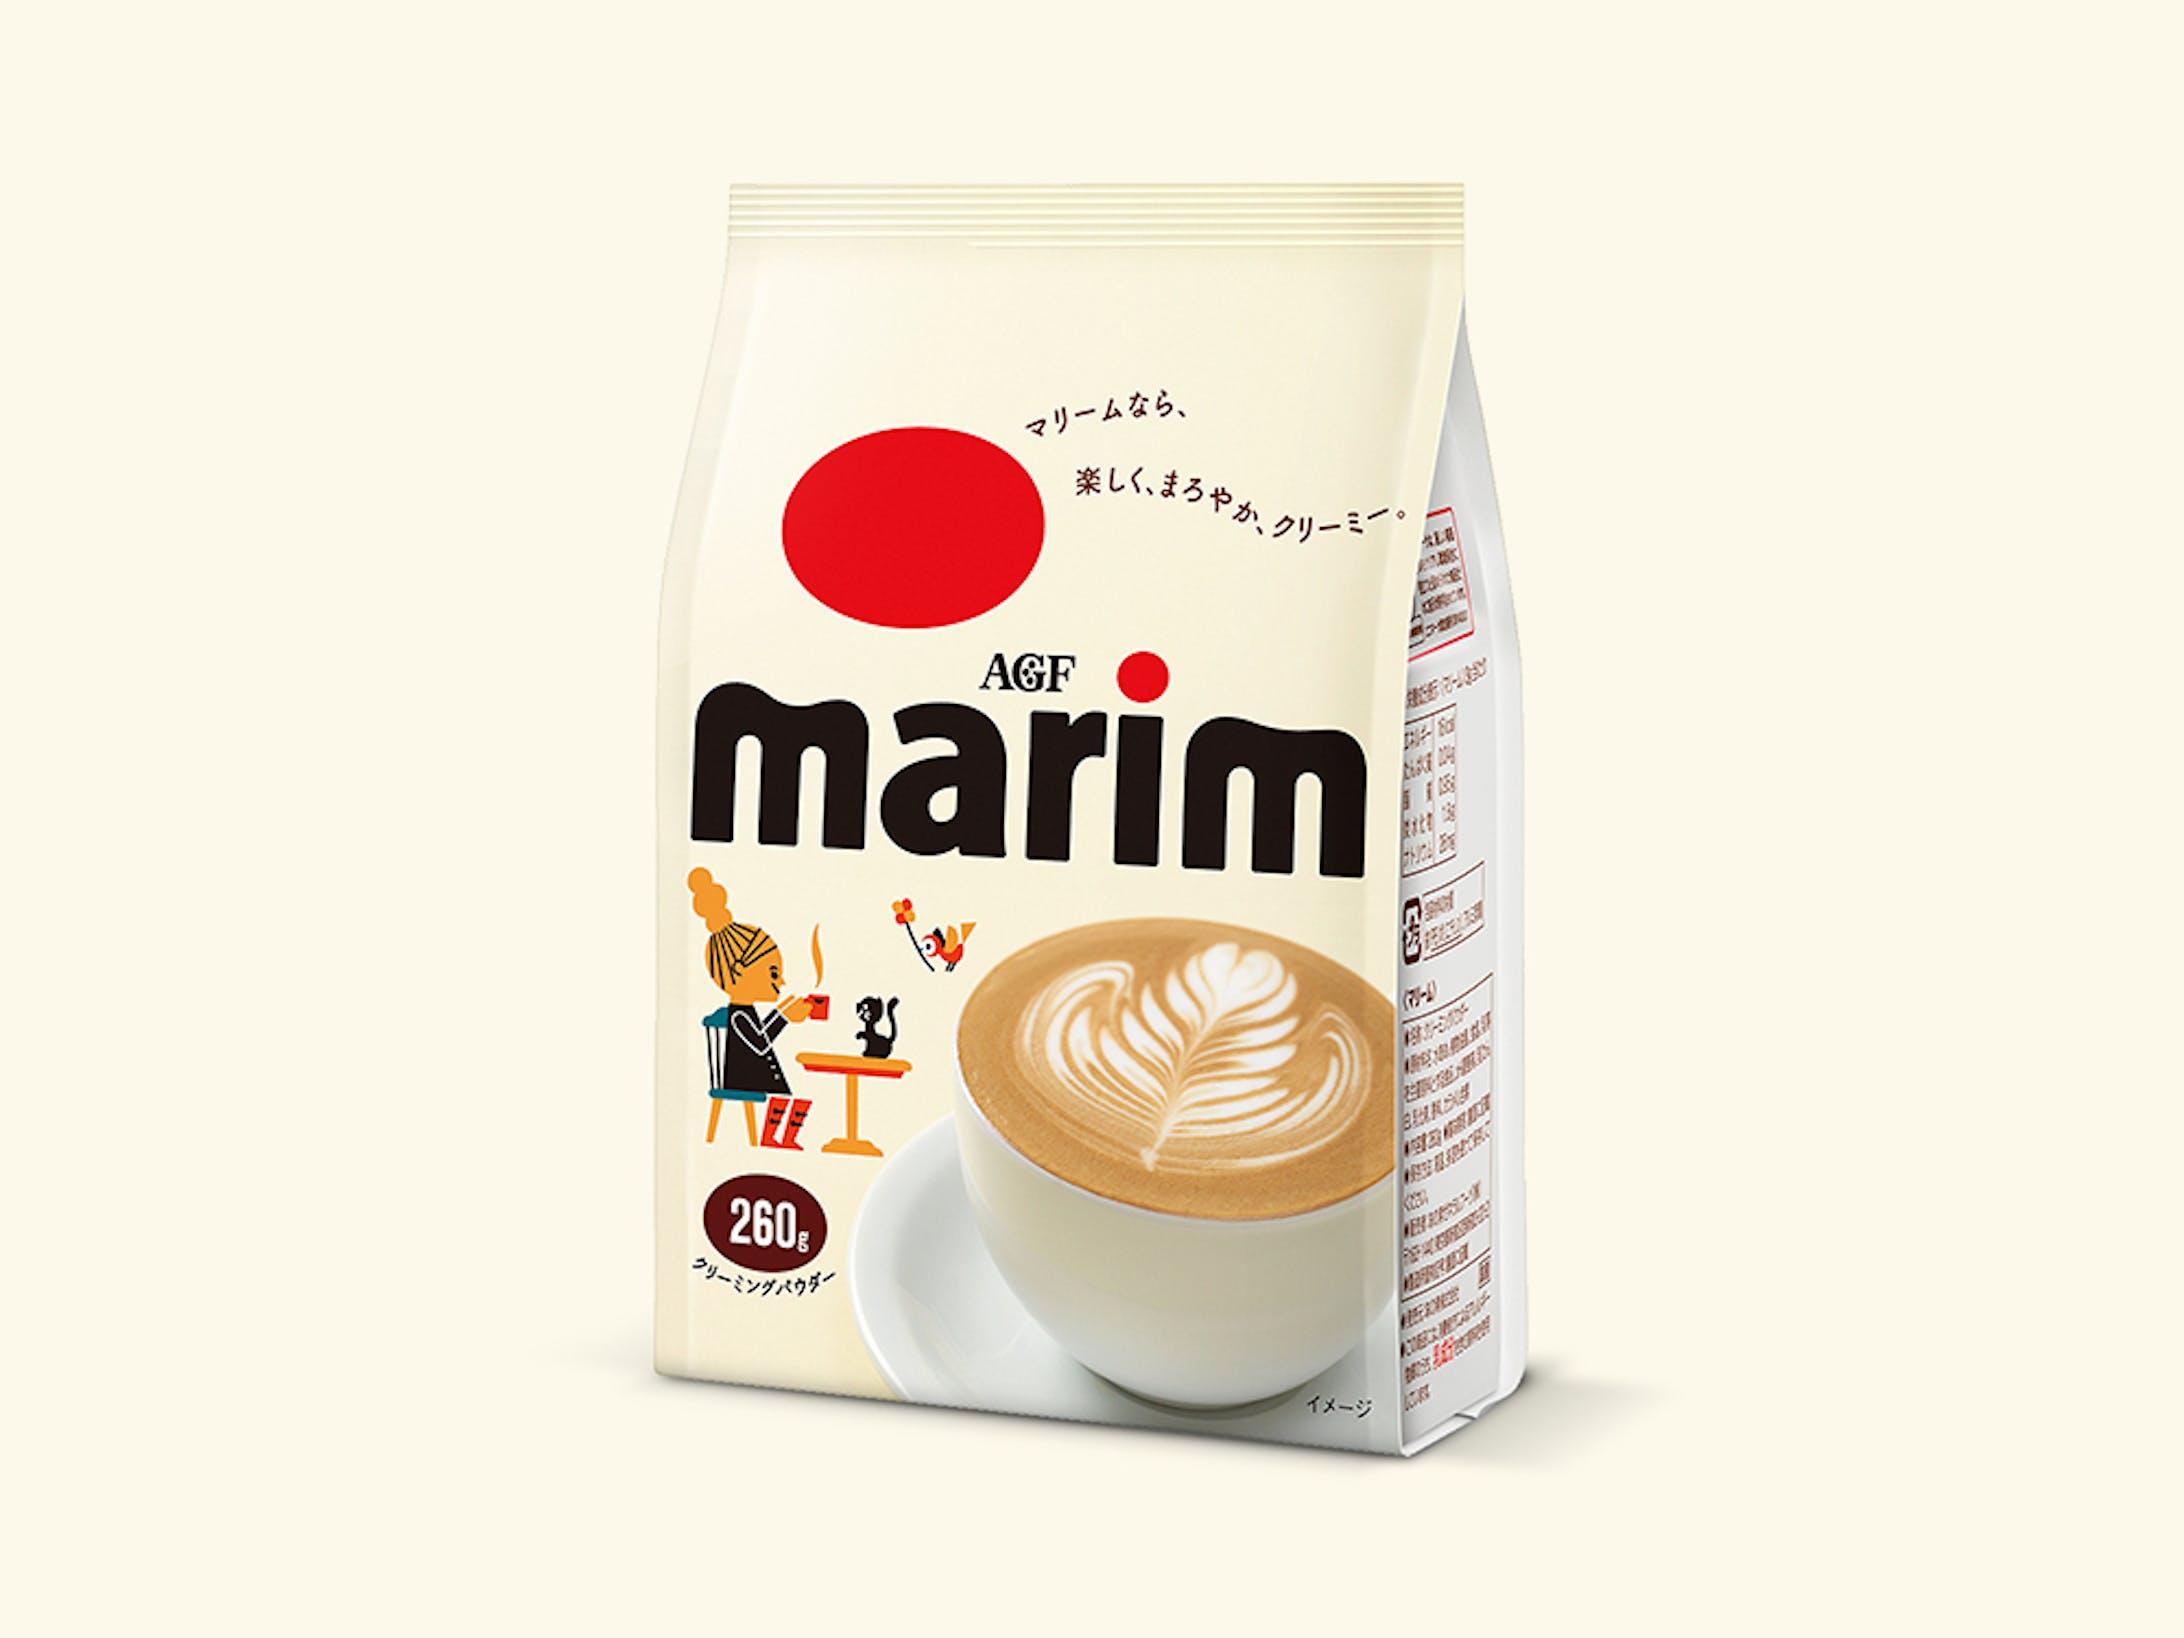 AGF marim パッケージ-1